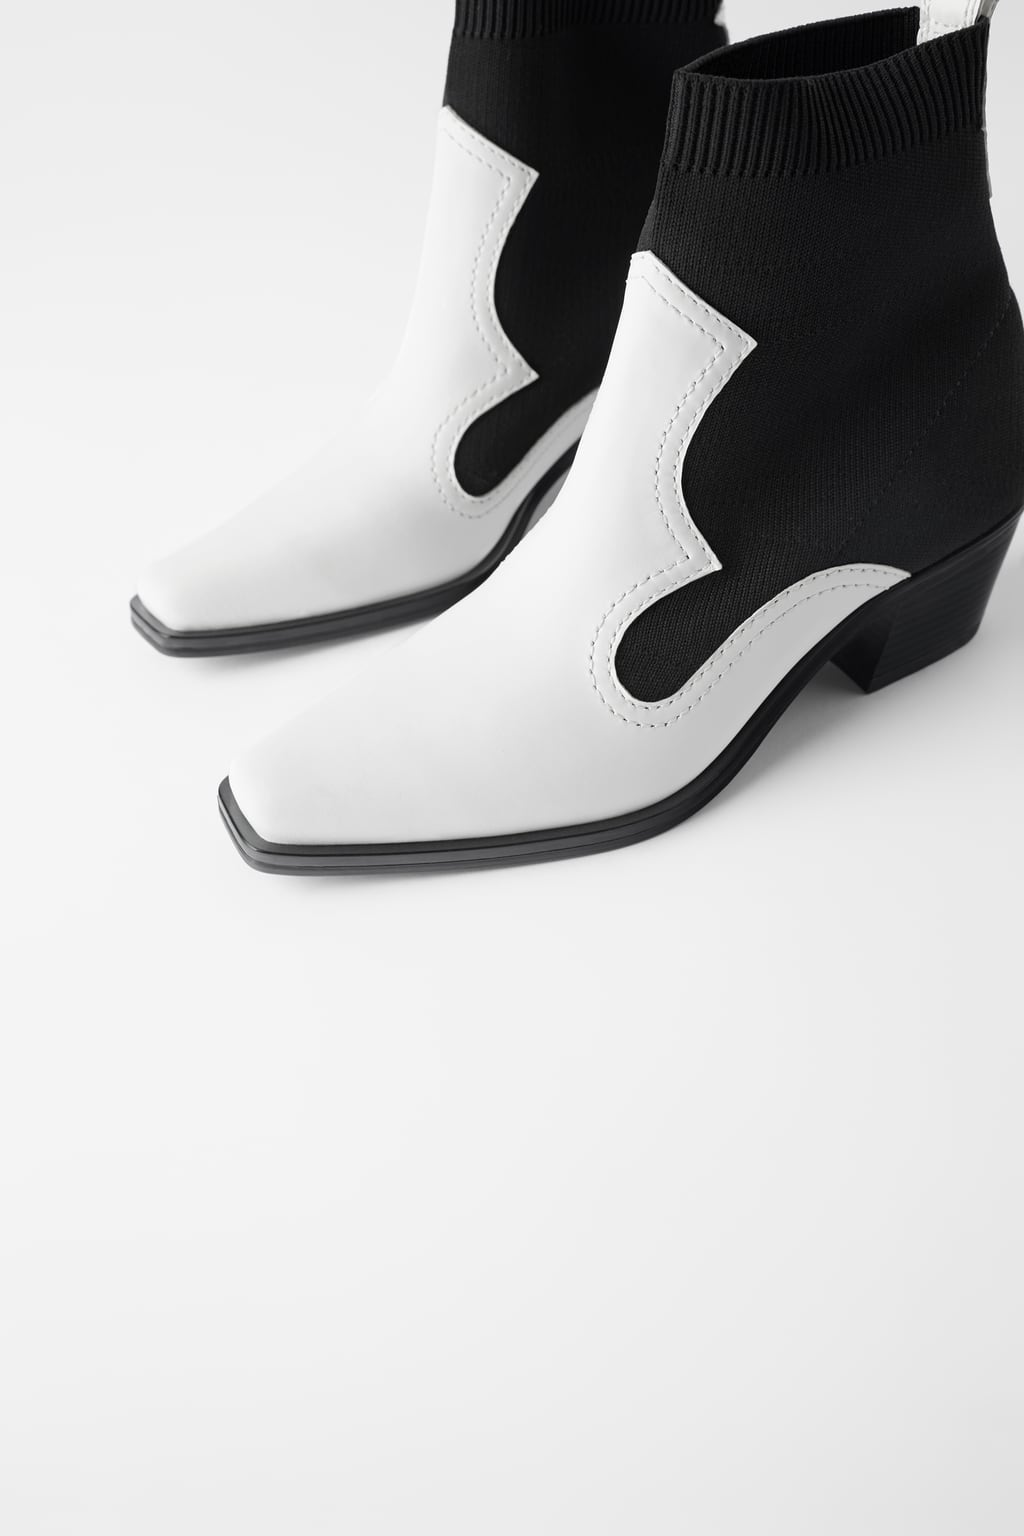 Zara Contrast Western Boots